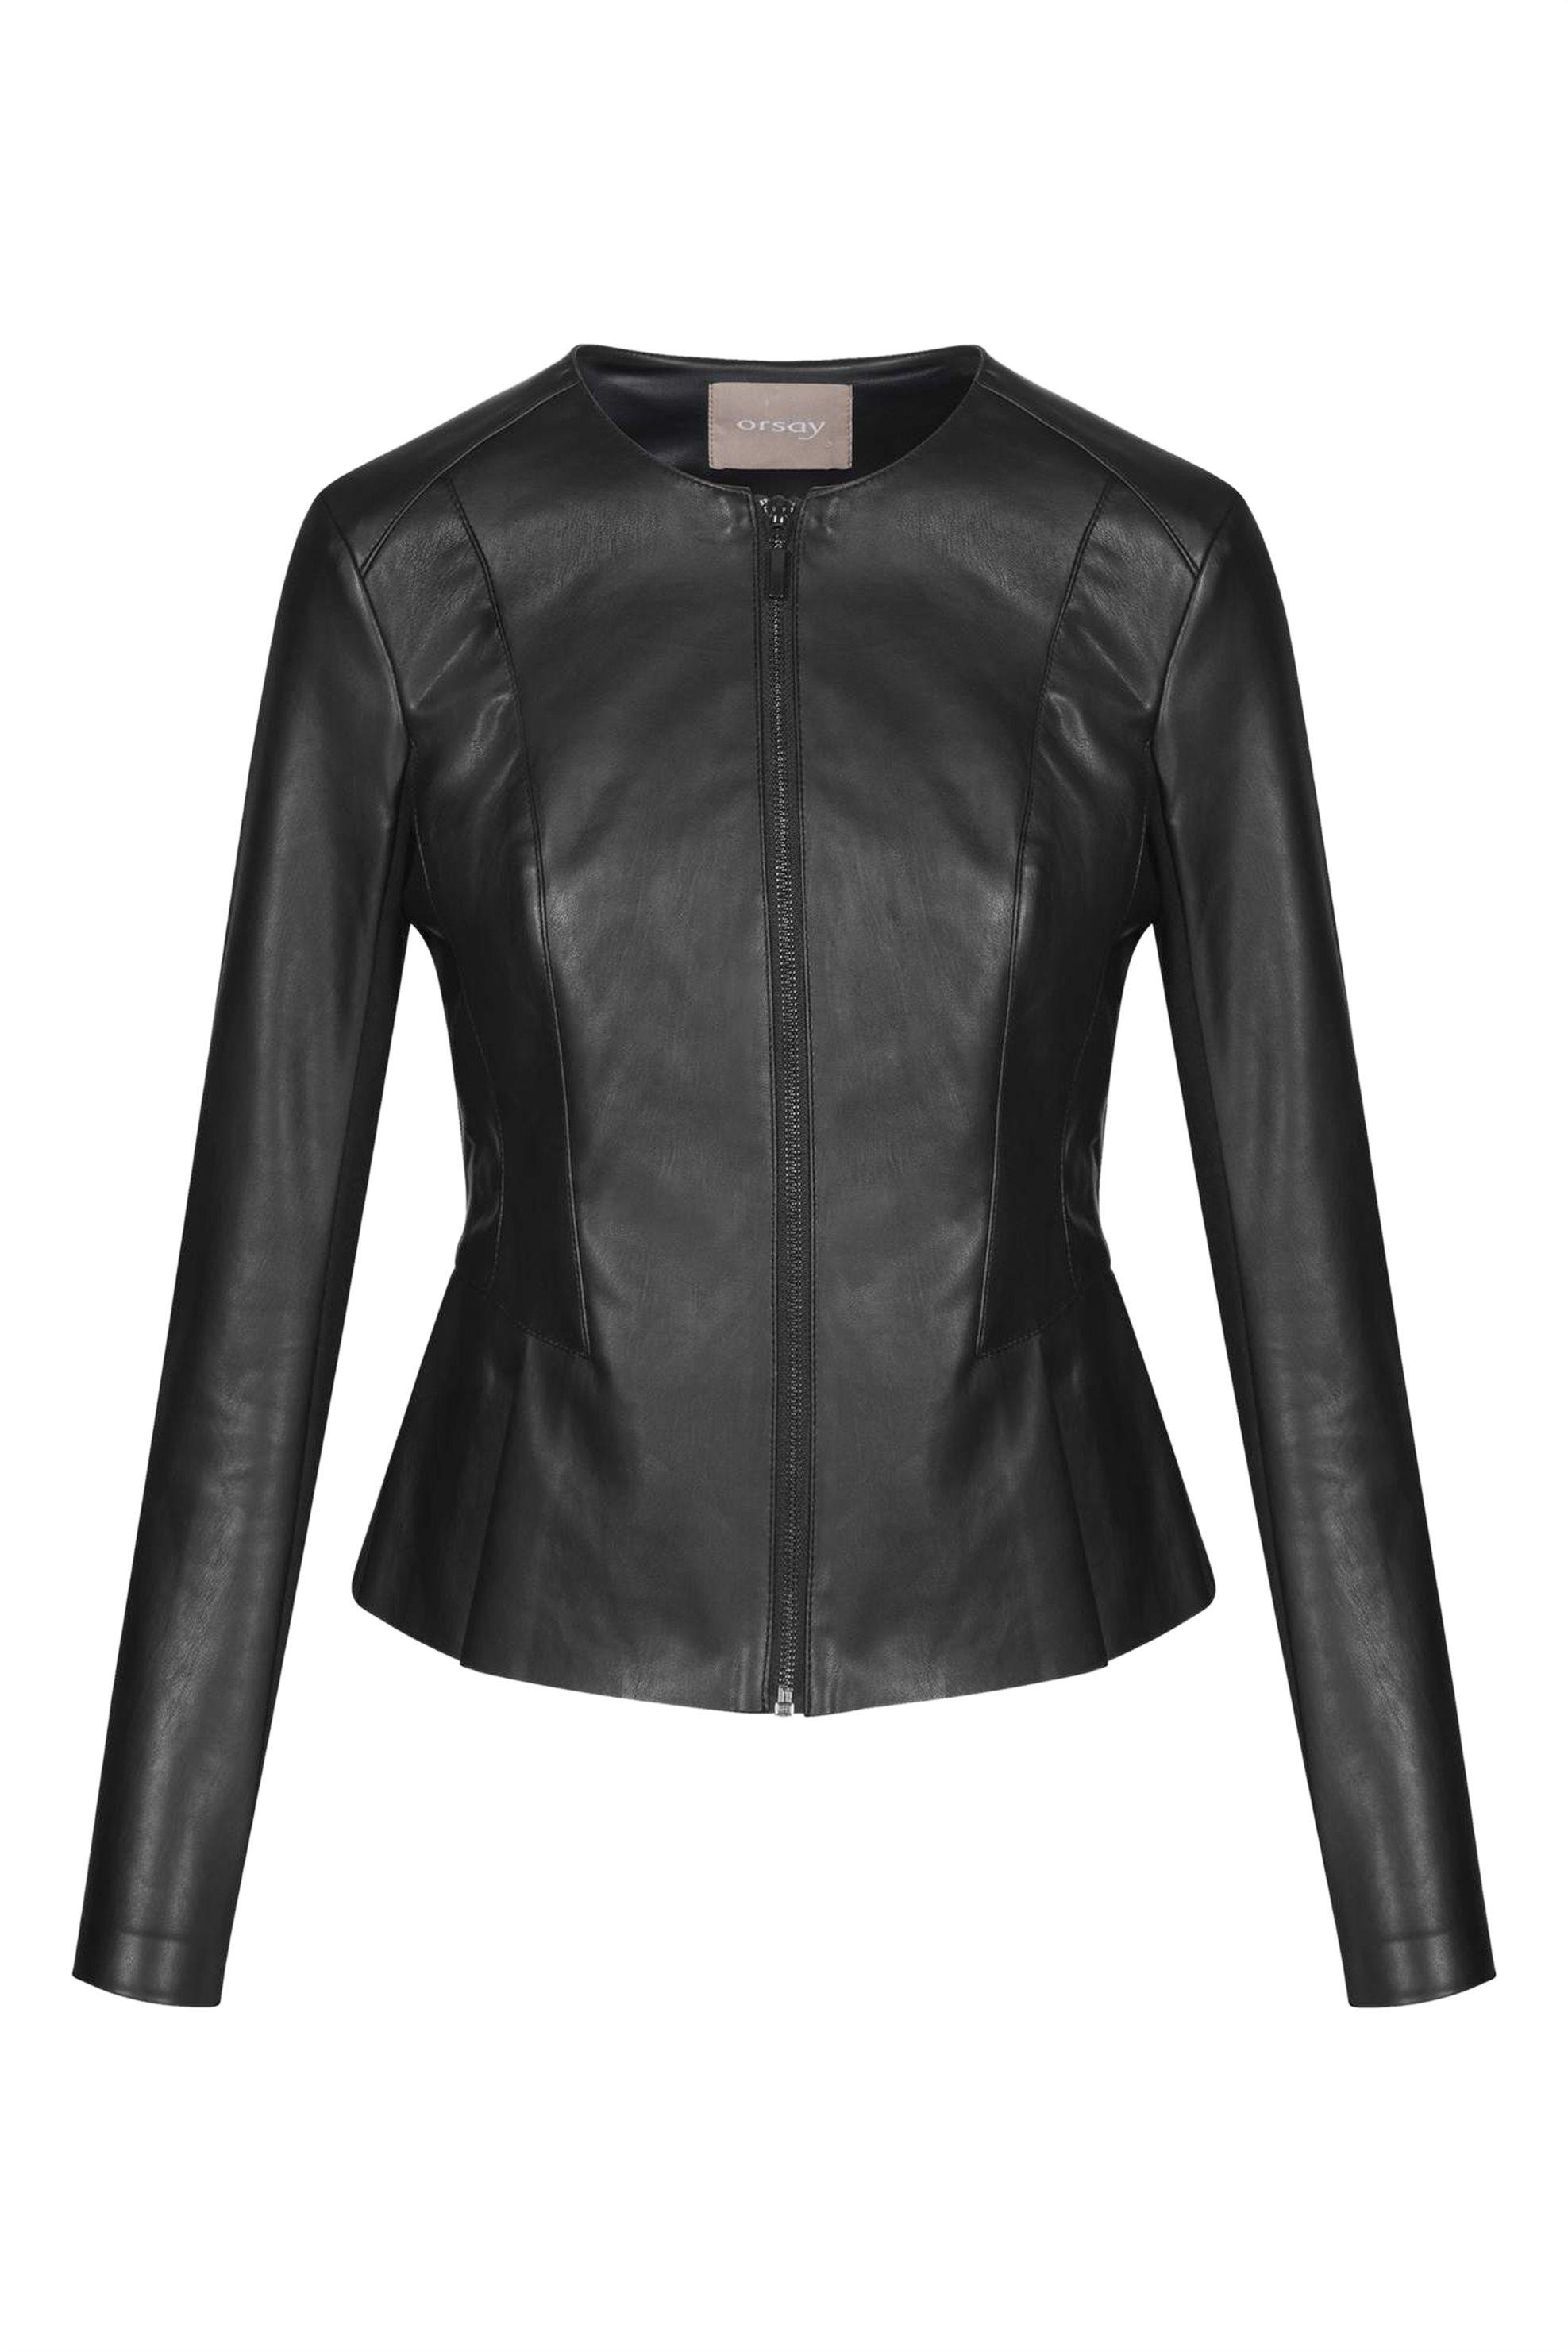 Orsay γυναικείο faux δερμάτινο μπουφάν μεσάτο - 800118-660000 - Μαύρο γυναικα   ρουχα   πανωφόρια   μπουφάν   σακάκια   δερμάτινα   faux δέρμα